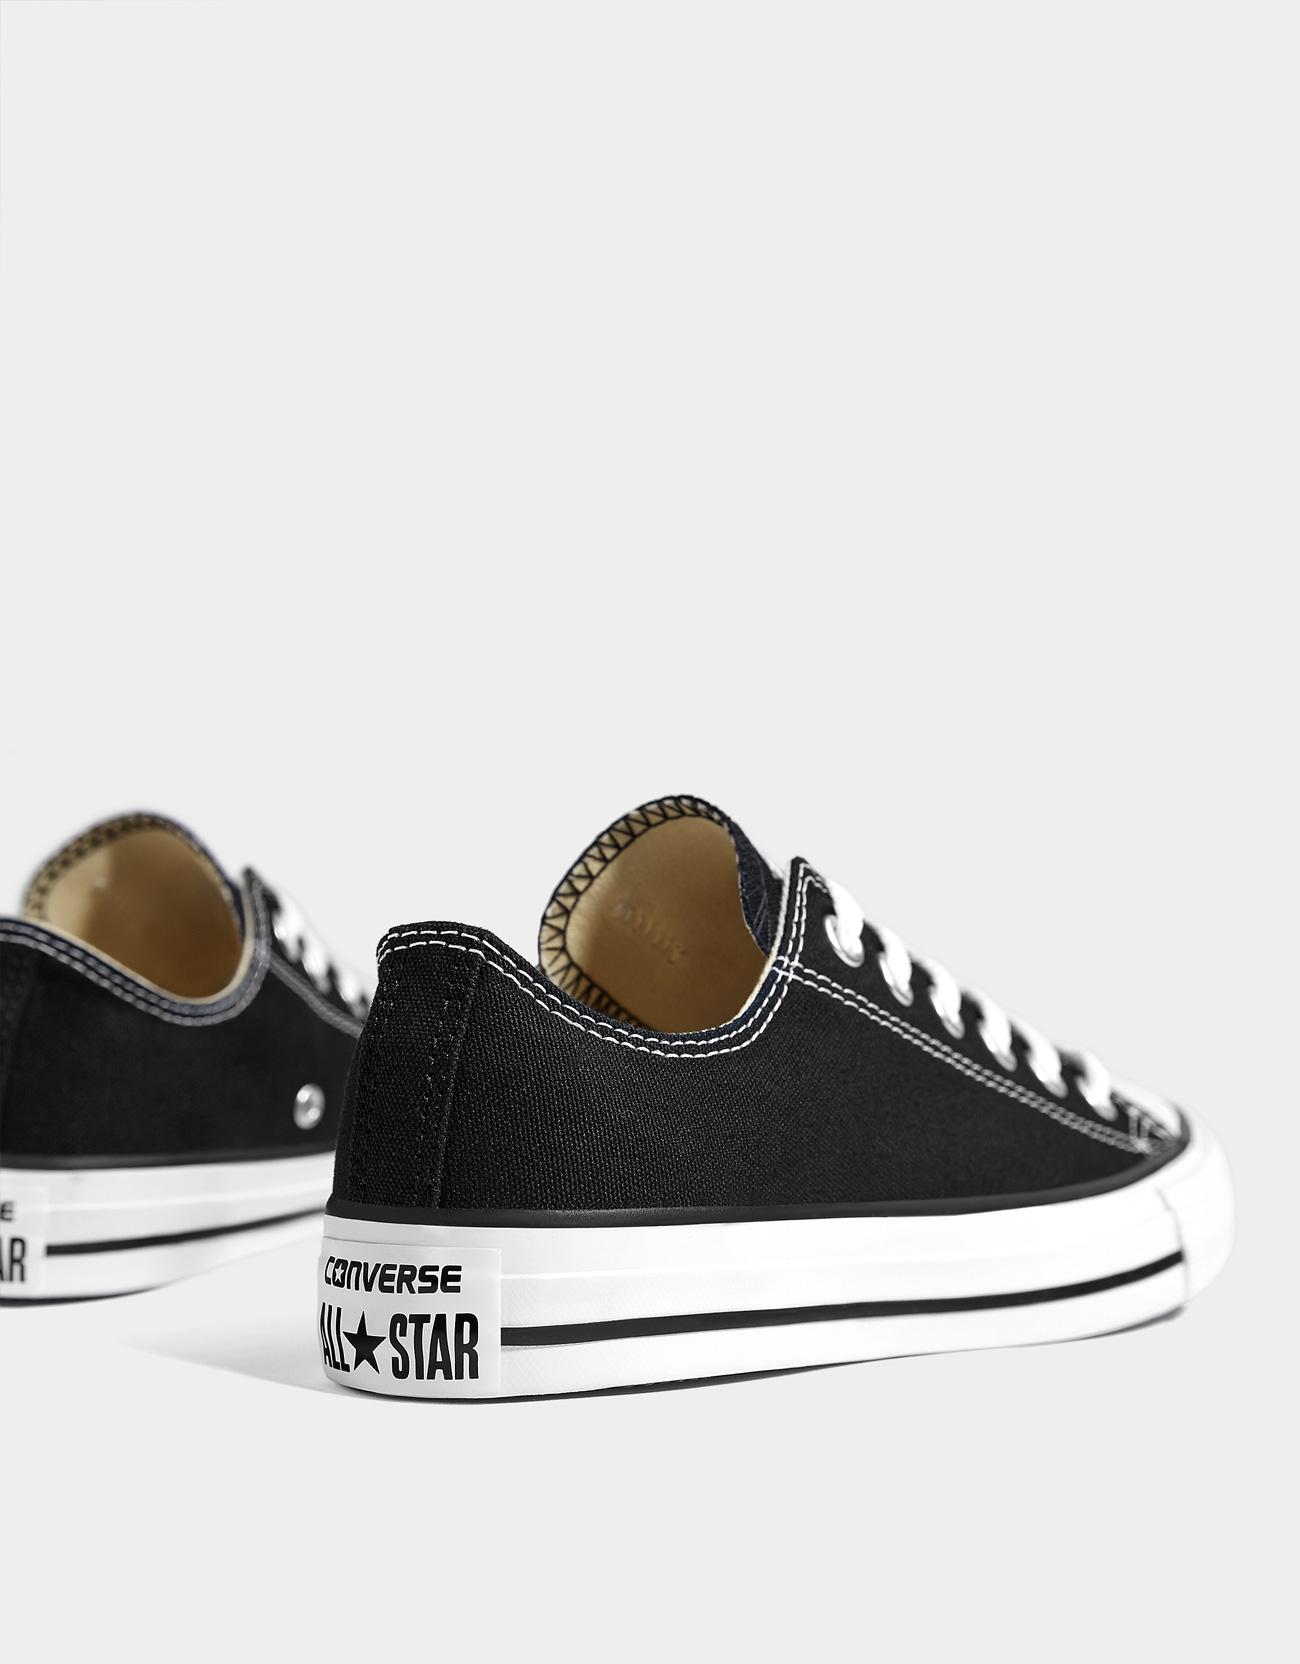 CONVERSE CHUCK TAYLOR ALL STAR sneakers - SHOES - Bershka Slovenia f4144ce0d